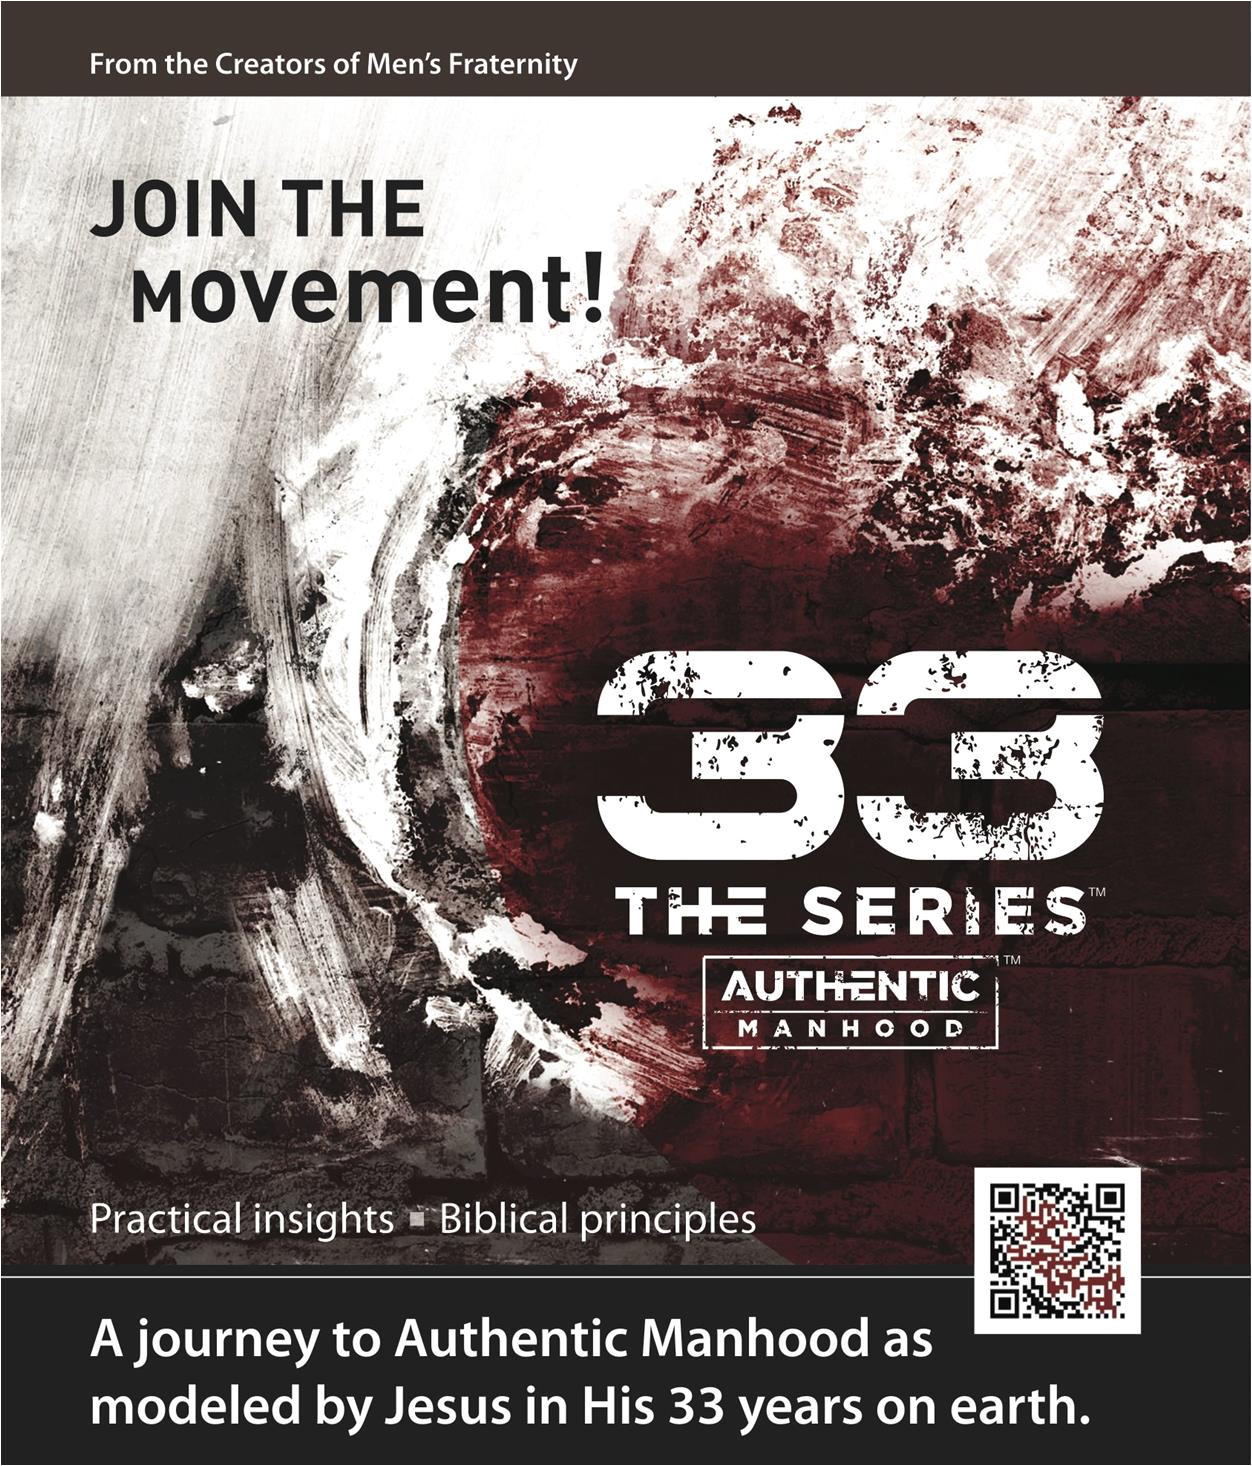 33theseries poster bleeds poster jpg